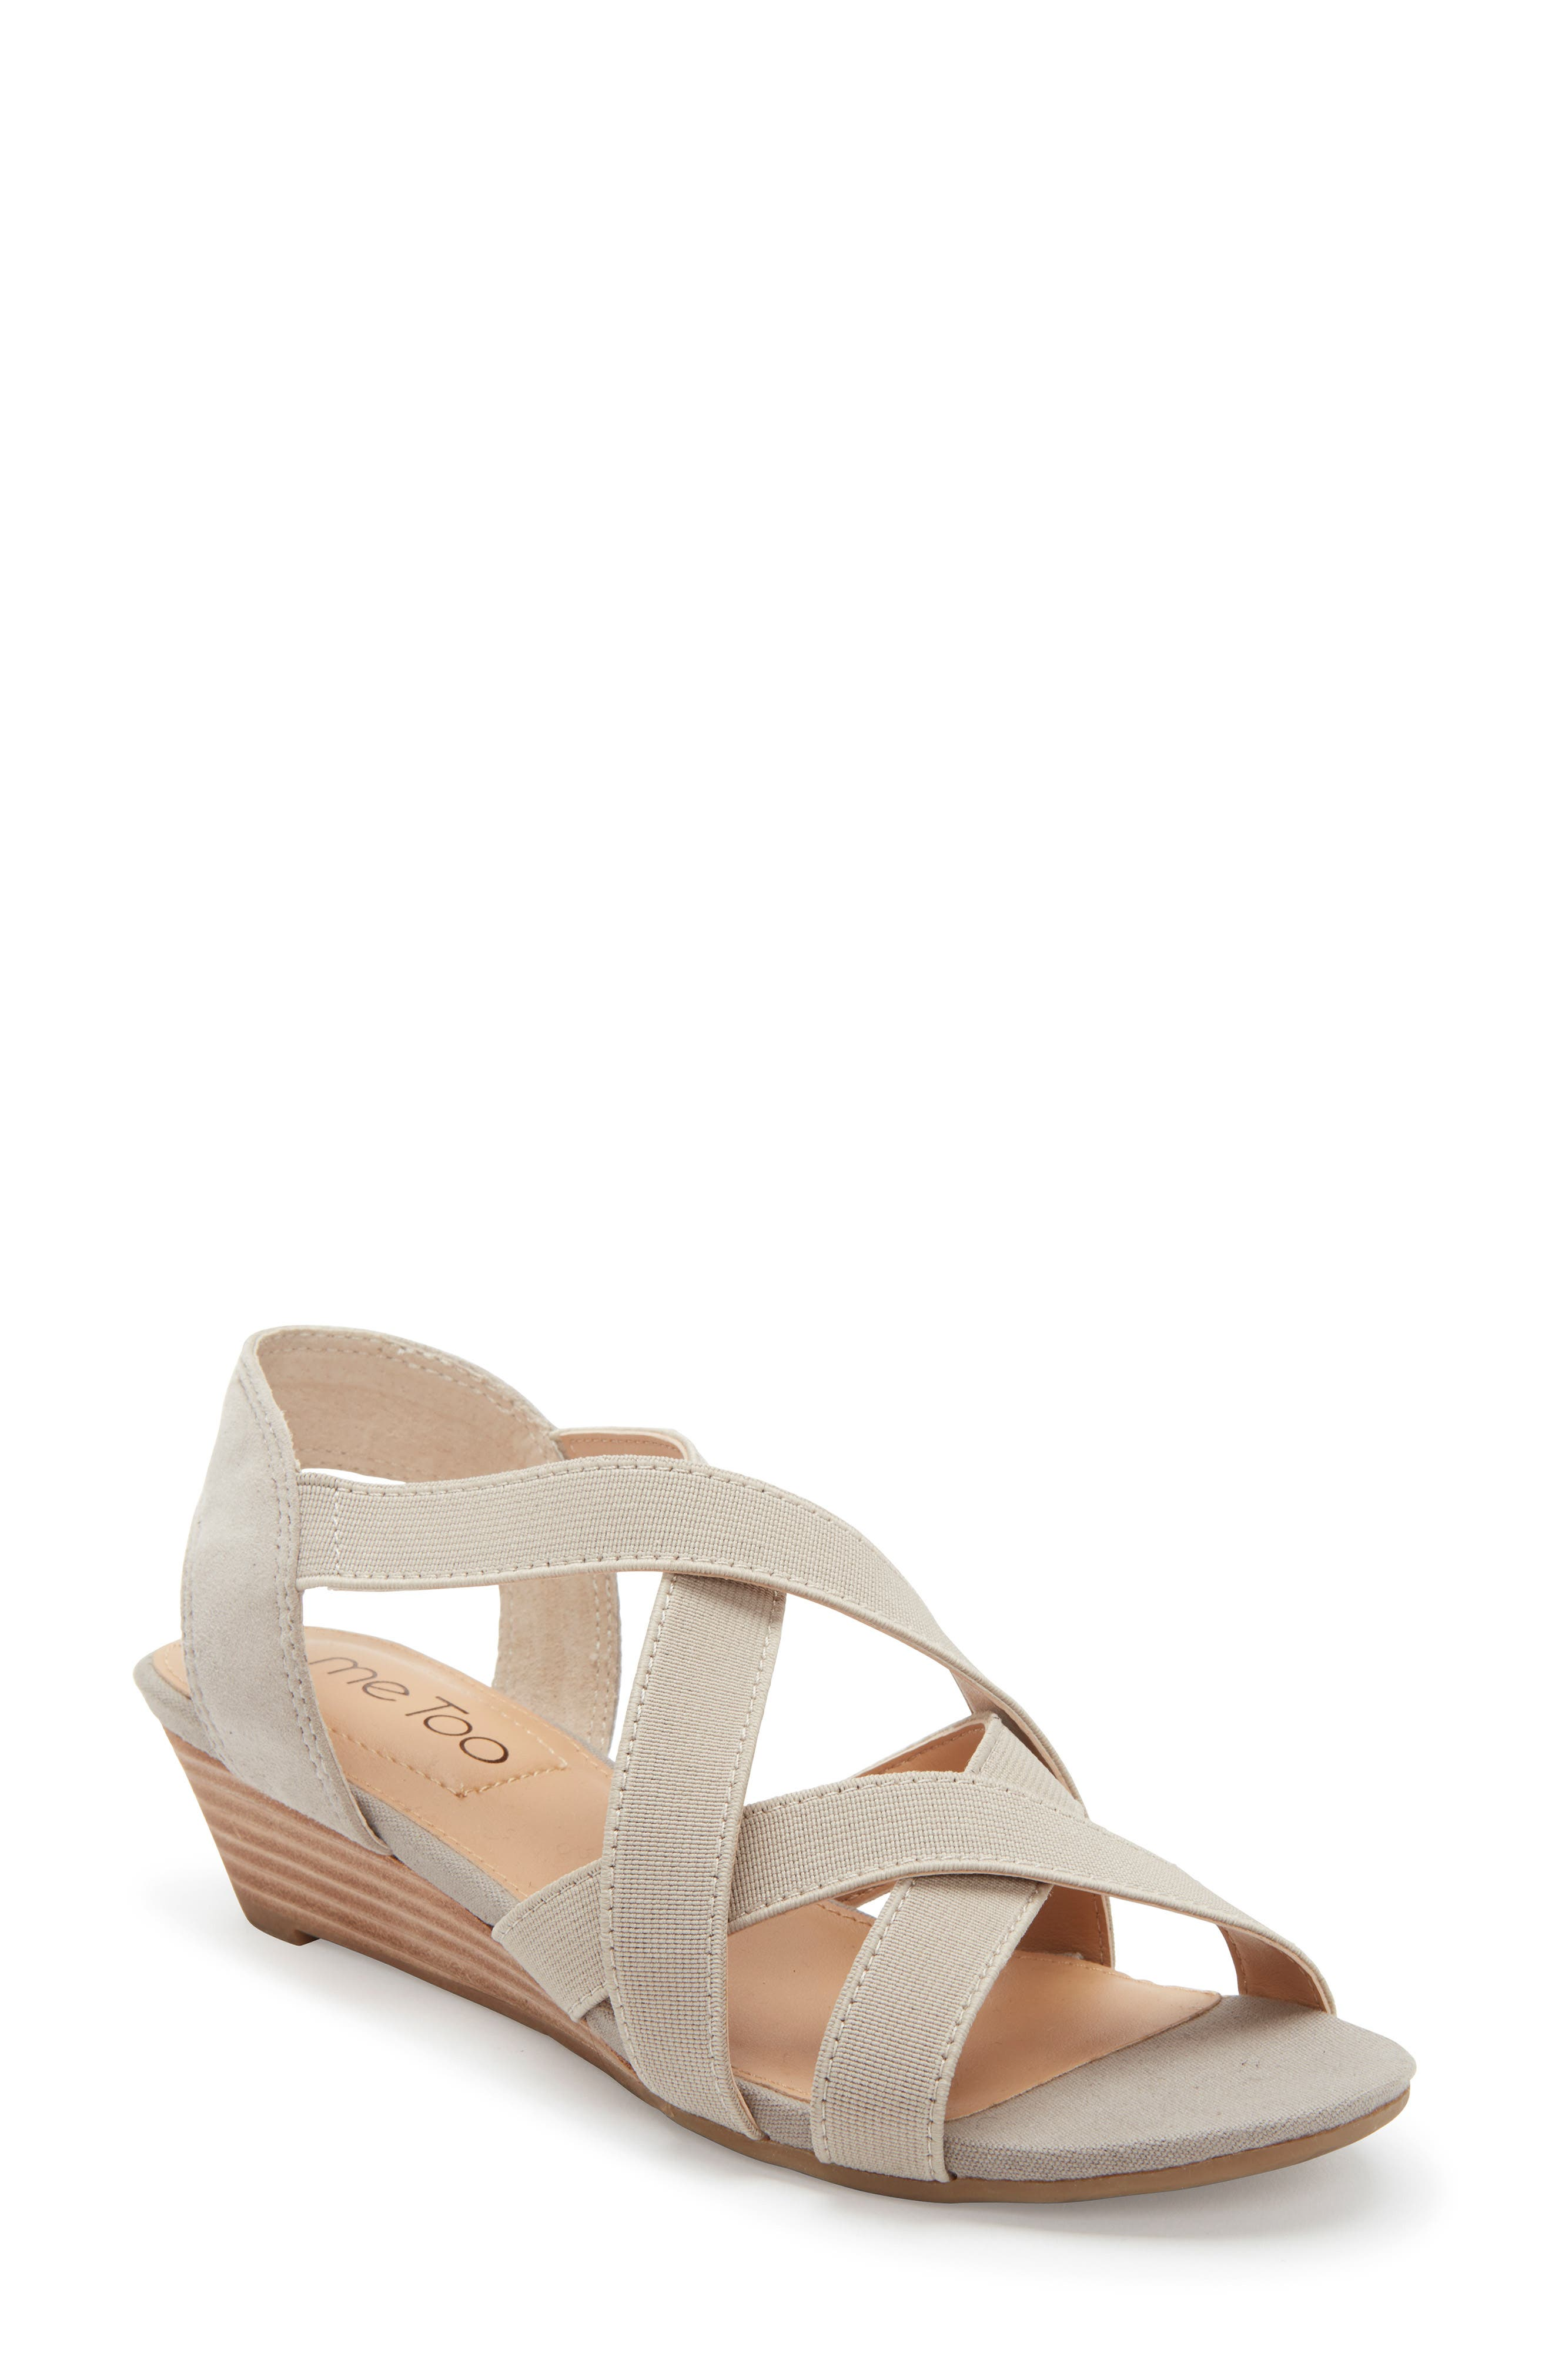 Me Too Saffron Wedge Sandal- Grey